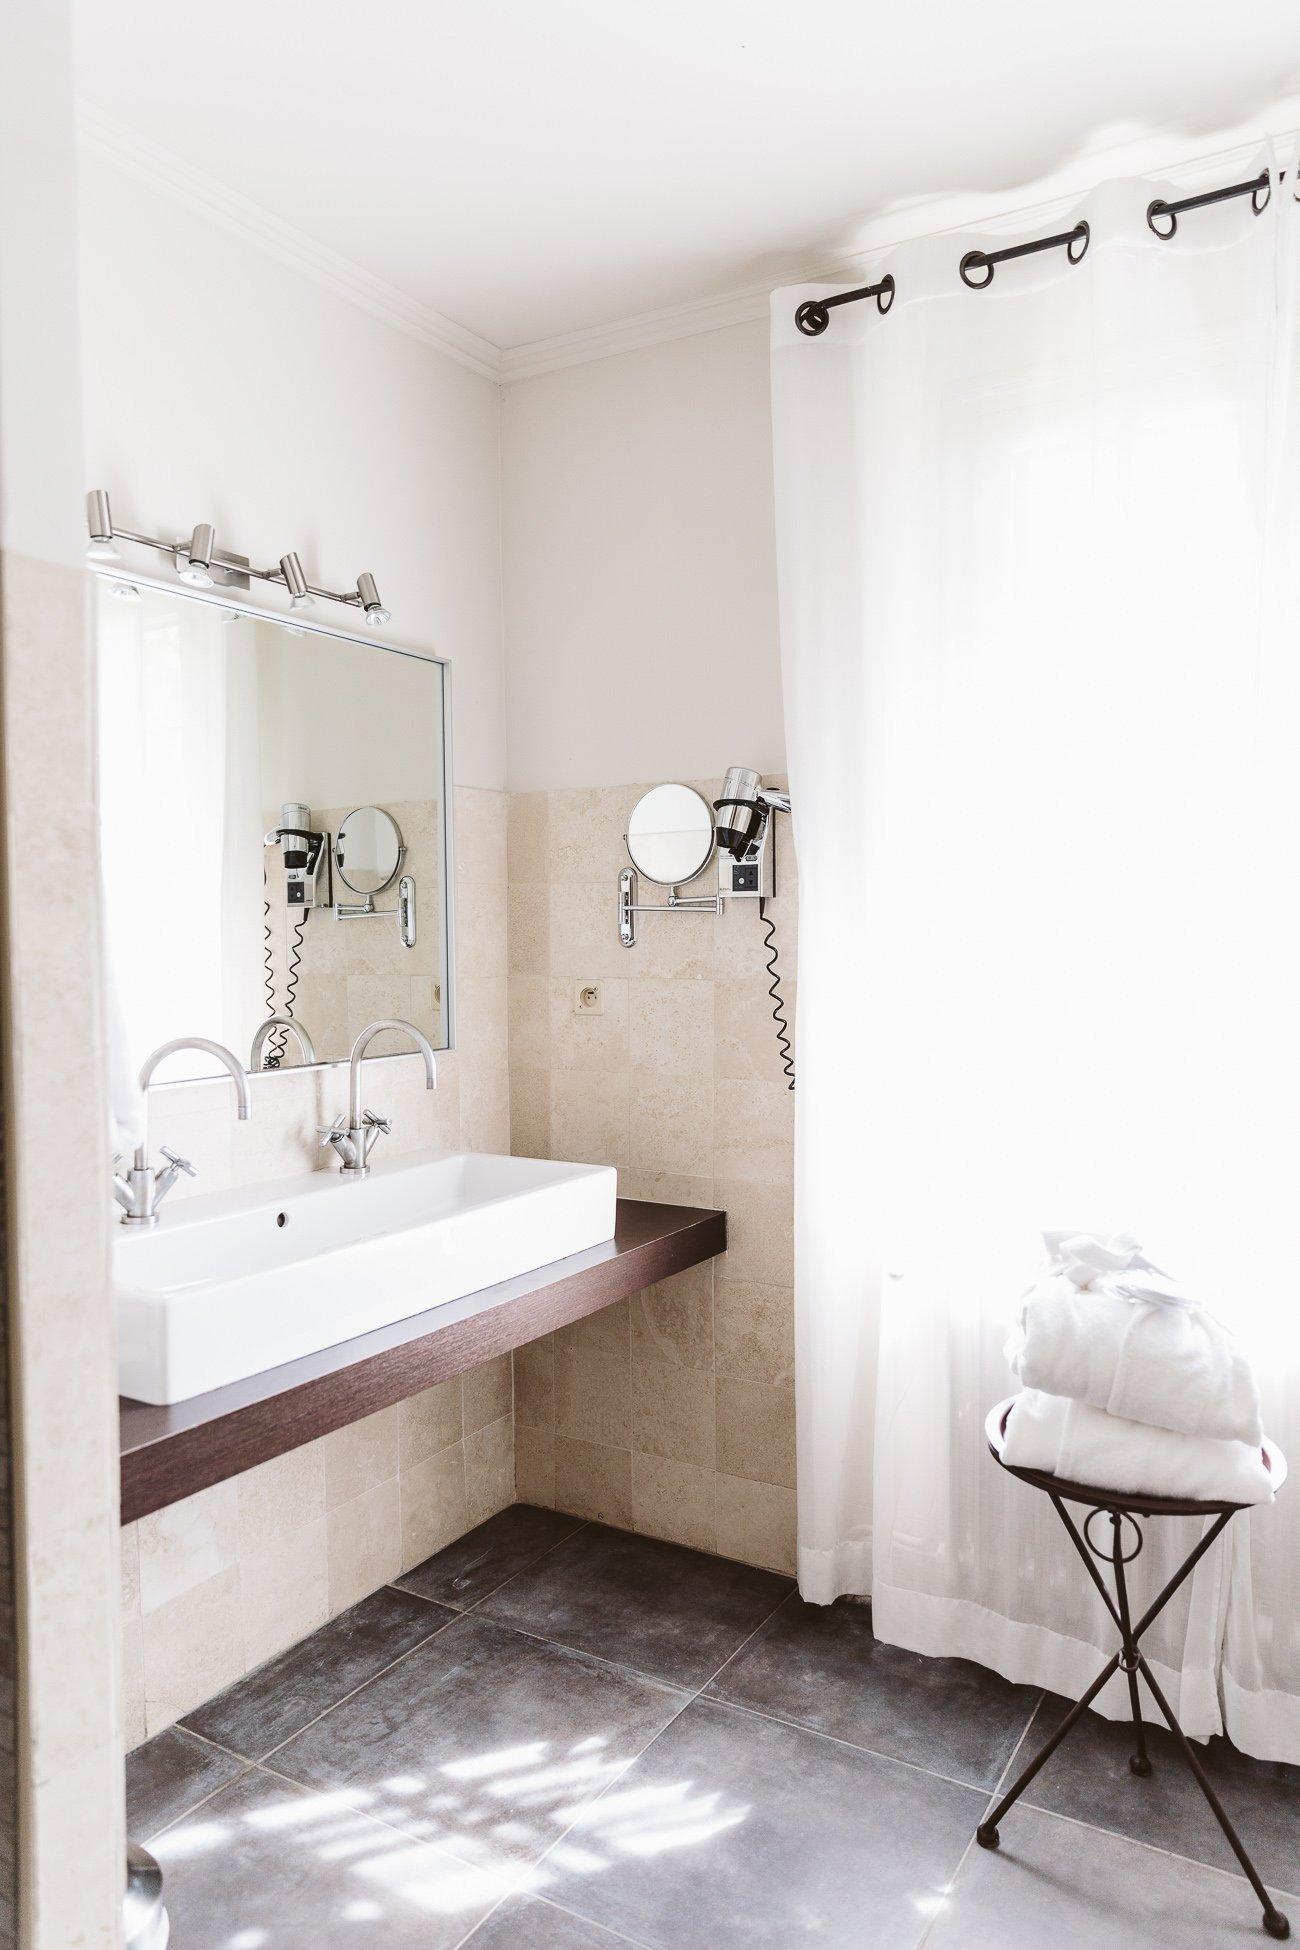 Bathroom at Baumanière Hotel